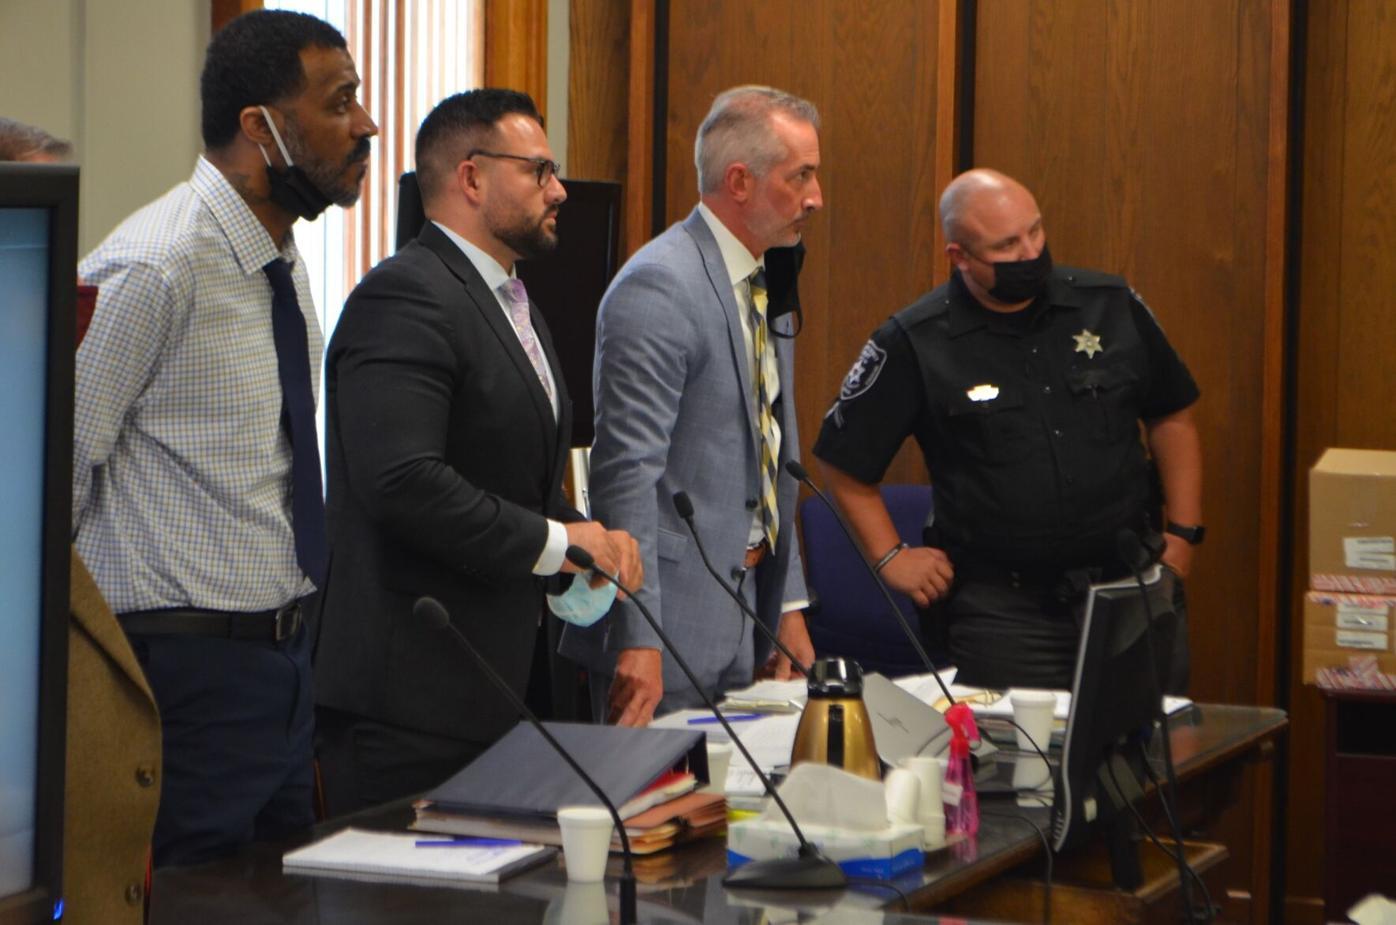 Lyon in court